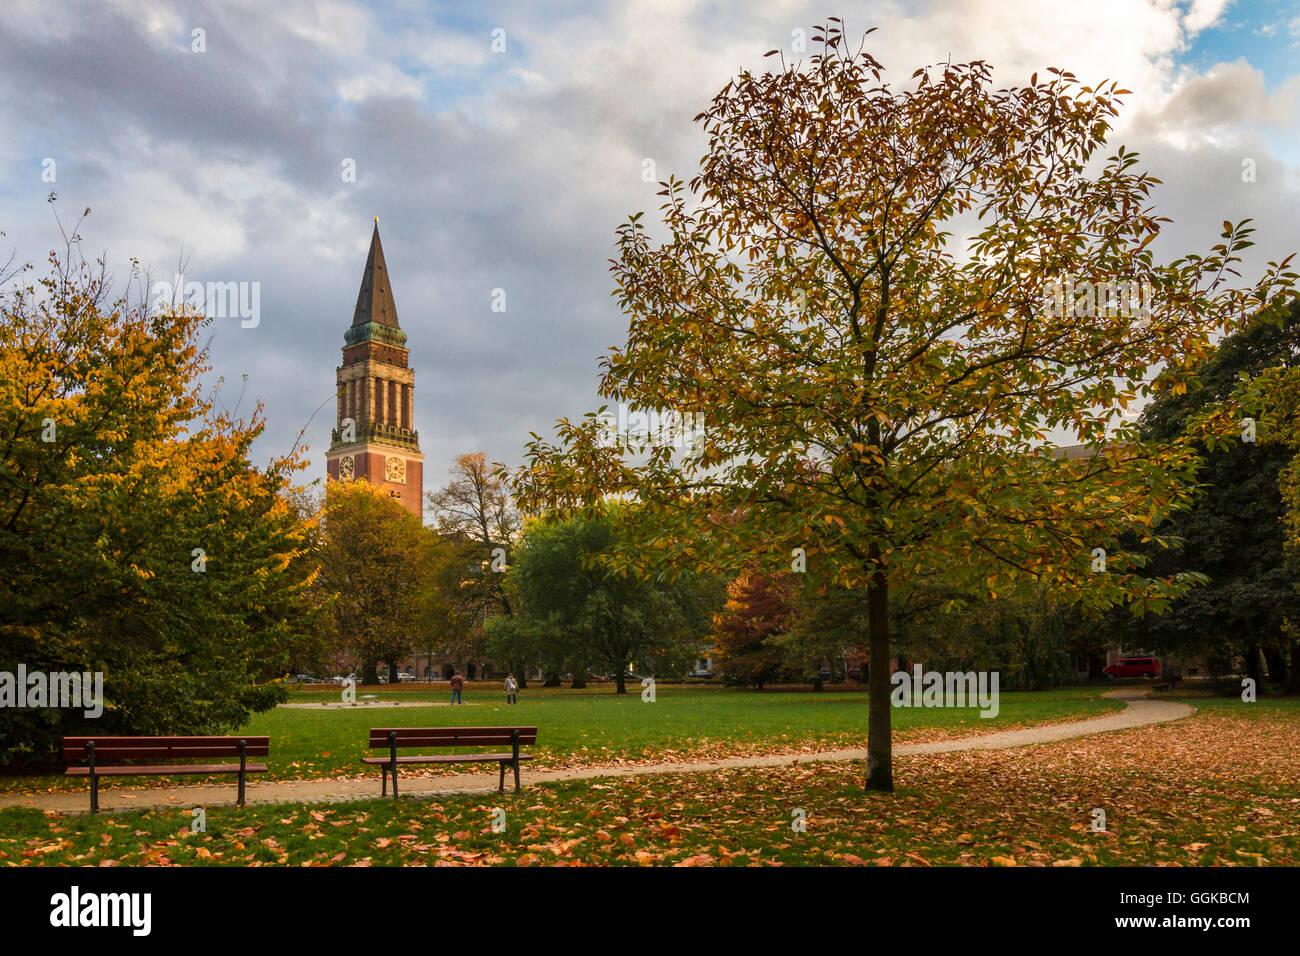 Kleiner Kiel, Kiel, Schleswig-Holstein, Germany - Stock Image